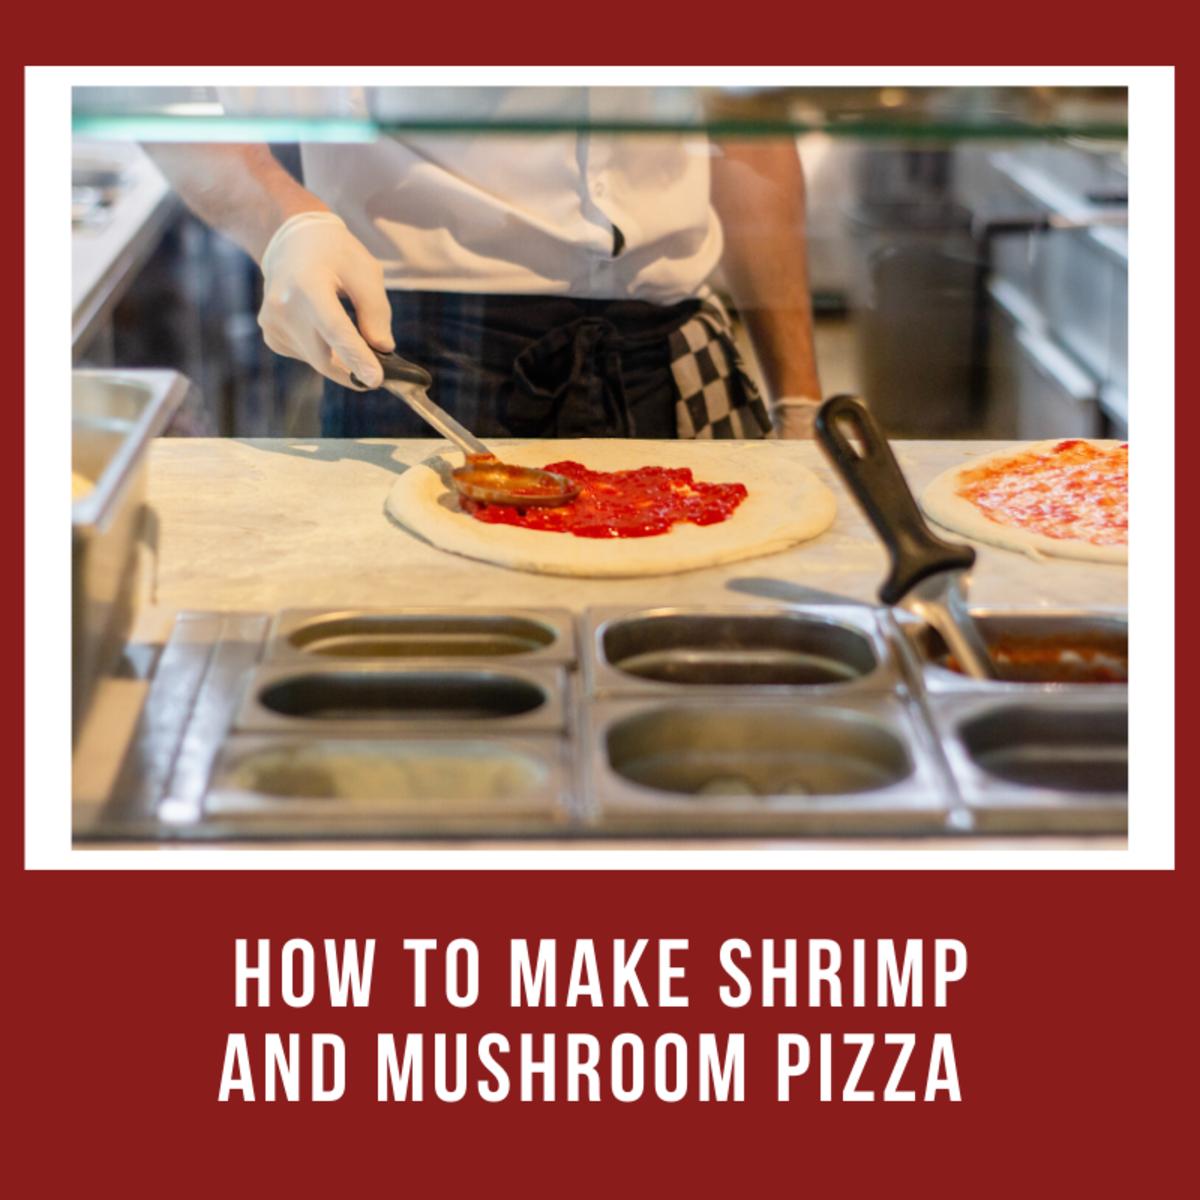 Shrimp and Mushroom Pizza With Vodka Sauce